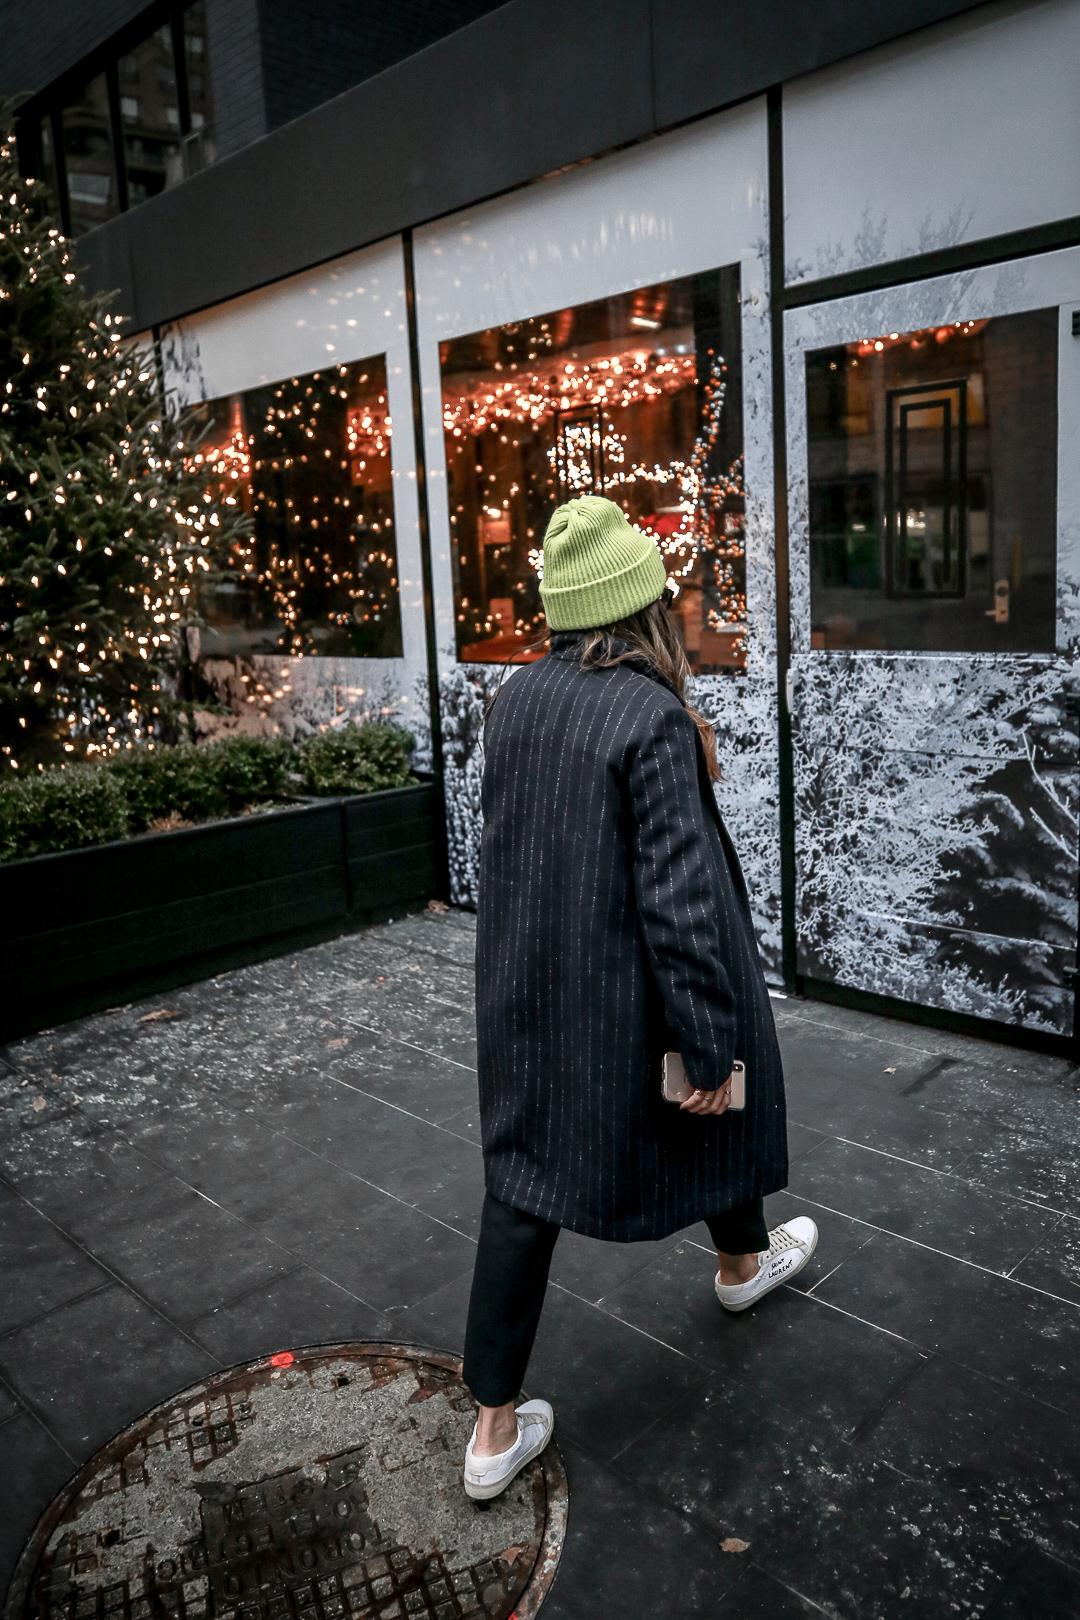 Nathalie Martin wearing Balenciaga logo sweater, Saint Laurent canvas sneakers, Aritzia pinstripe Stedman coat, and neon green beanie and Bonlook Way sunglasses, streetstyle, woahstyle.com_3993.jpg